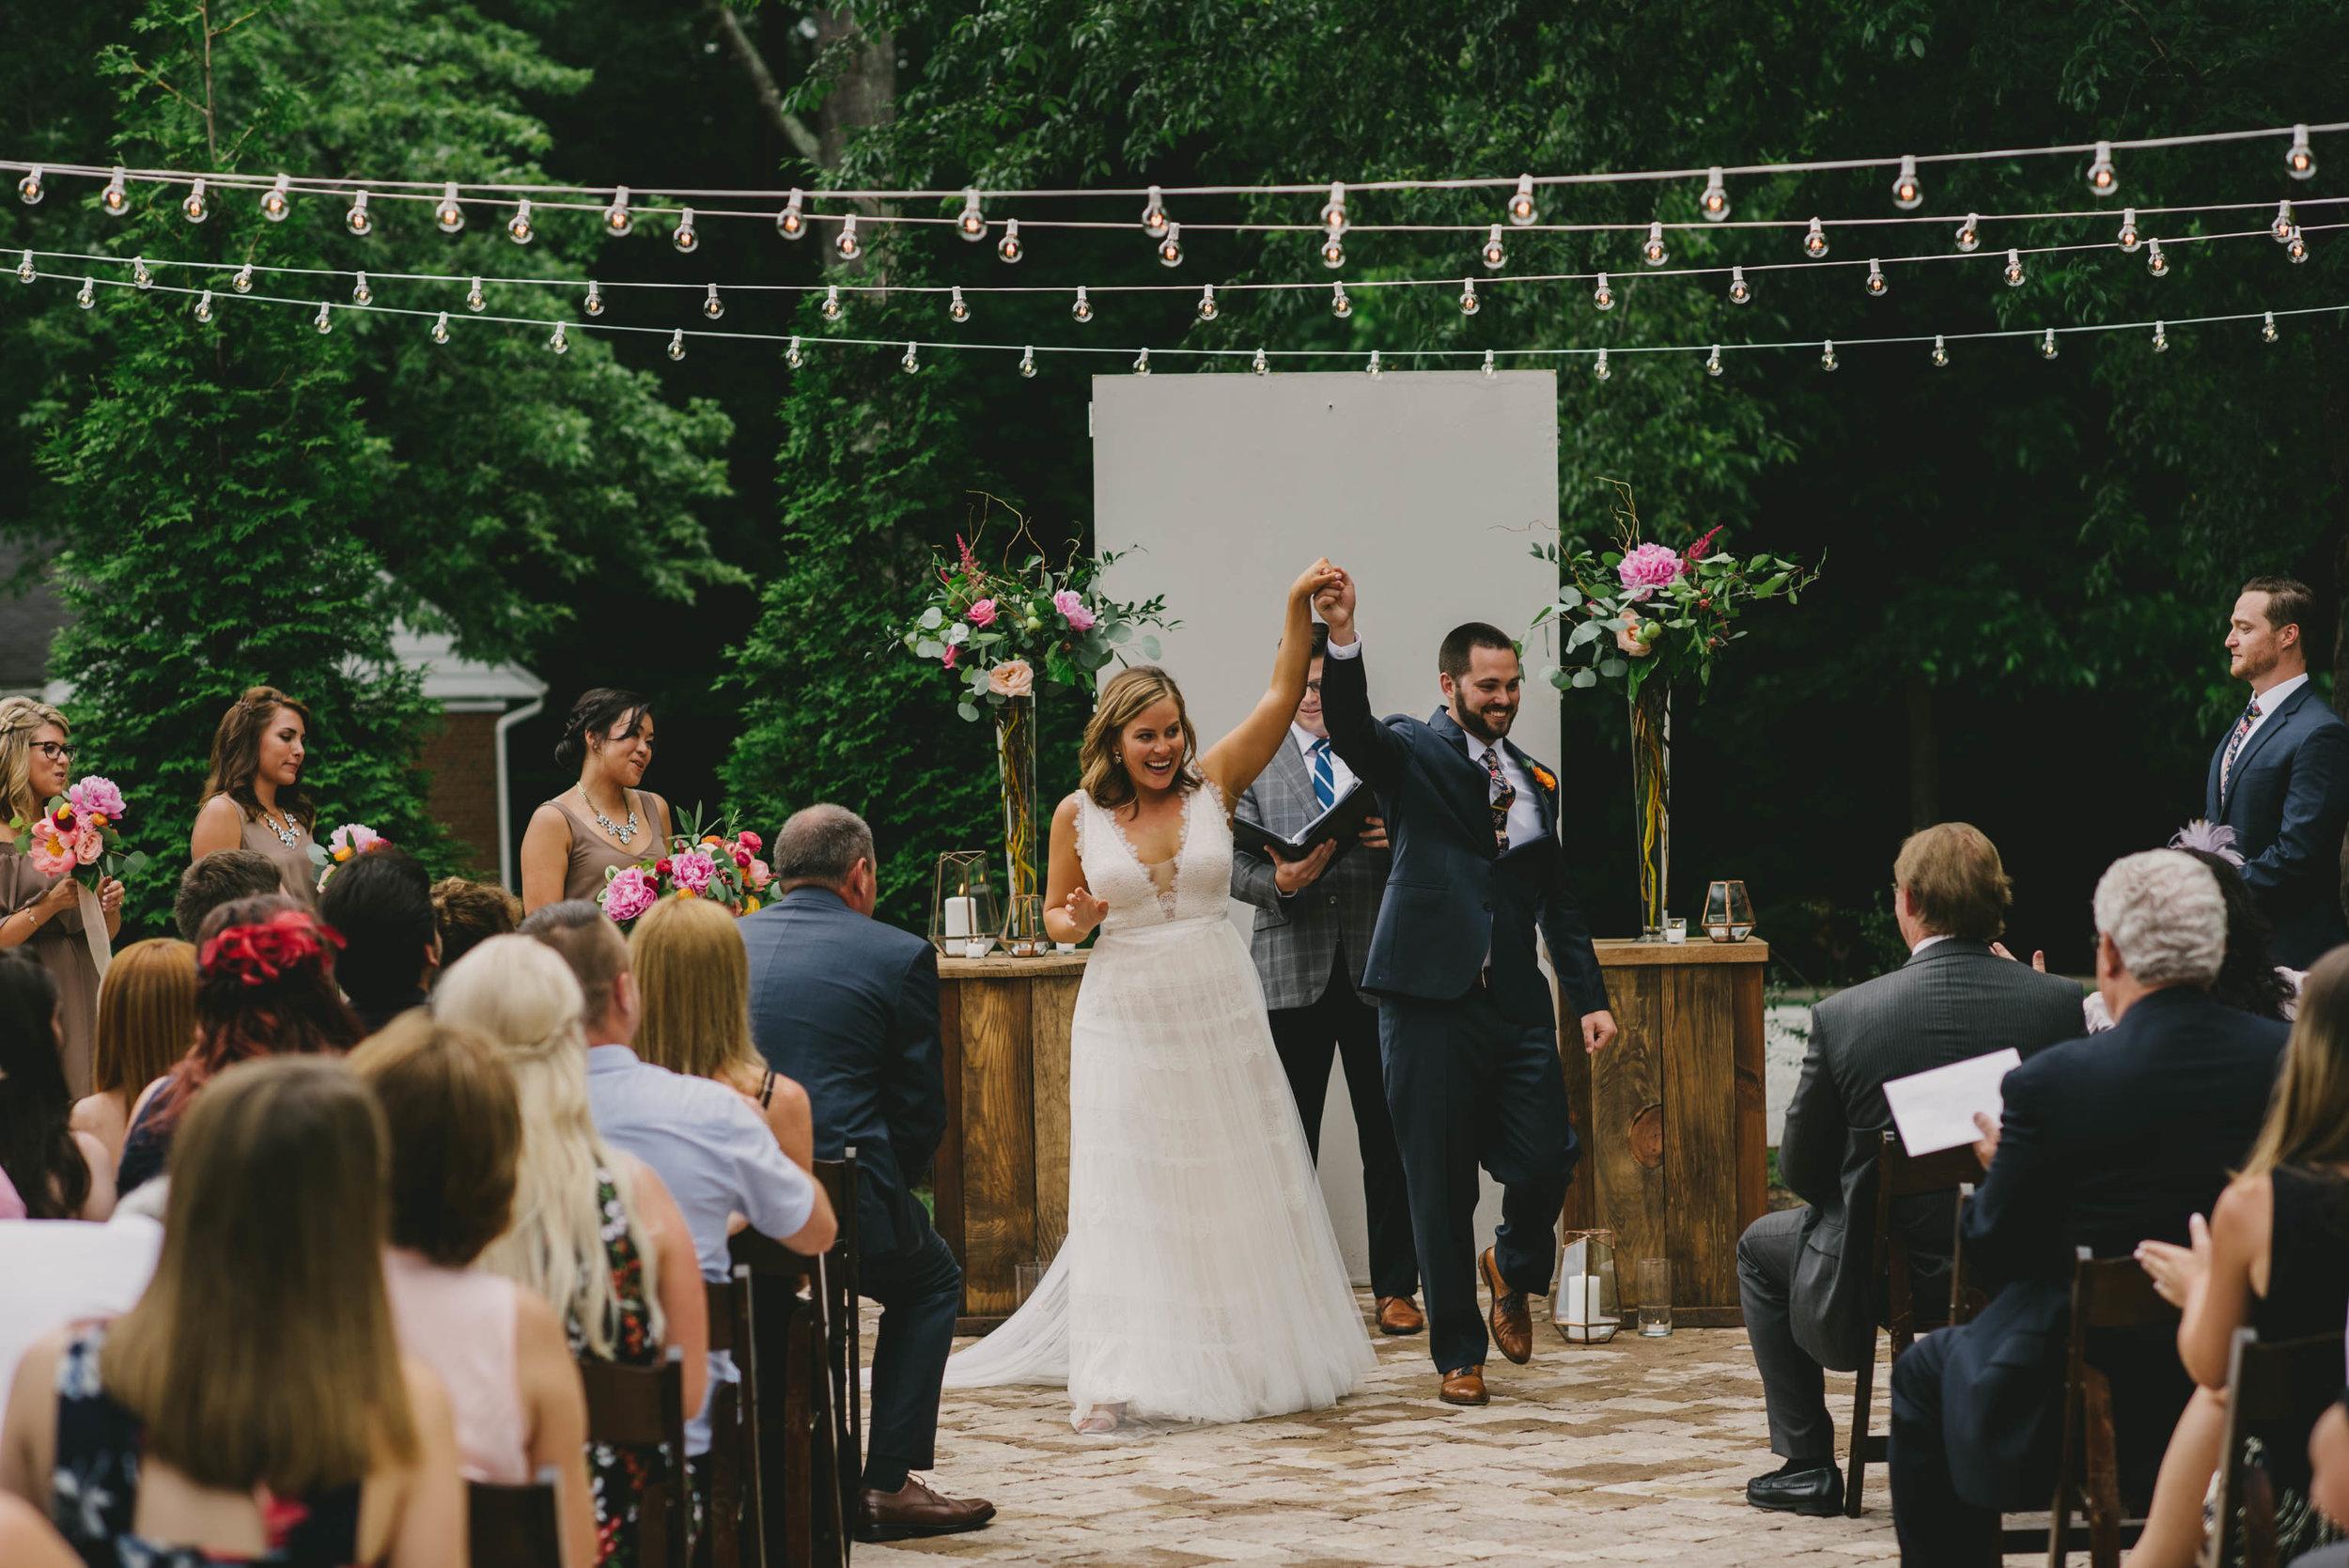 mims-house-wedding-bride-and-groom-photo.jpg